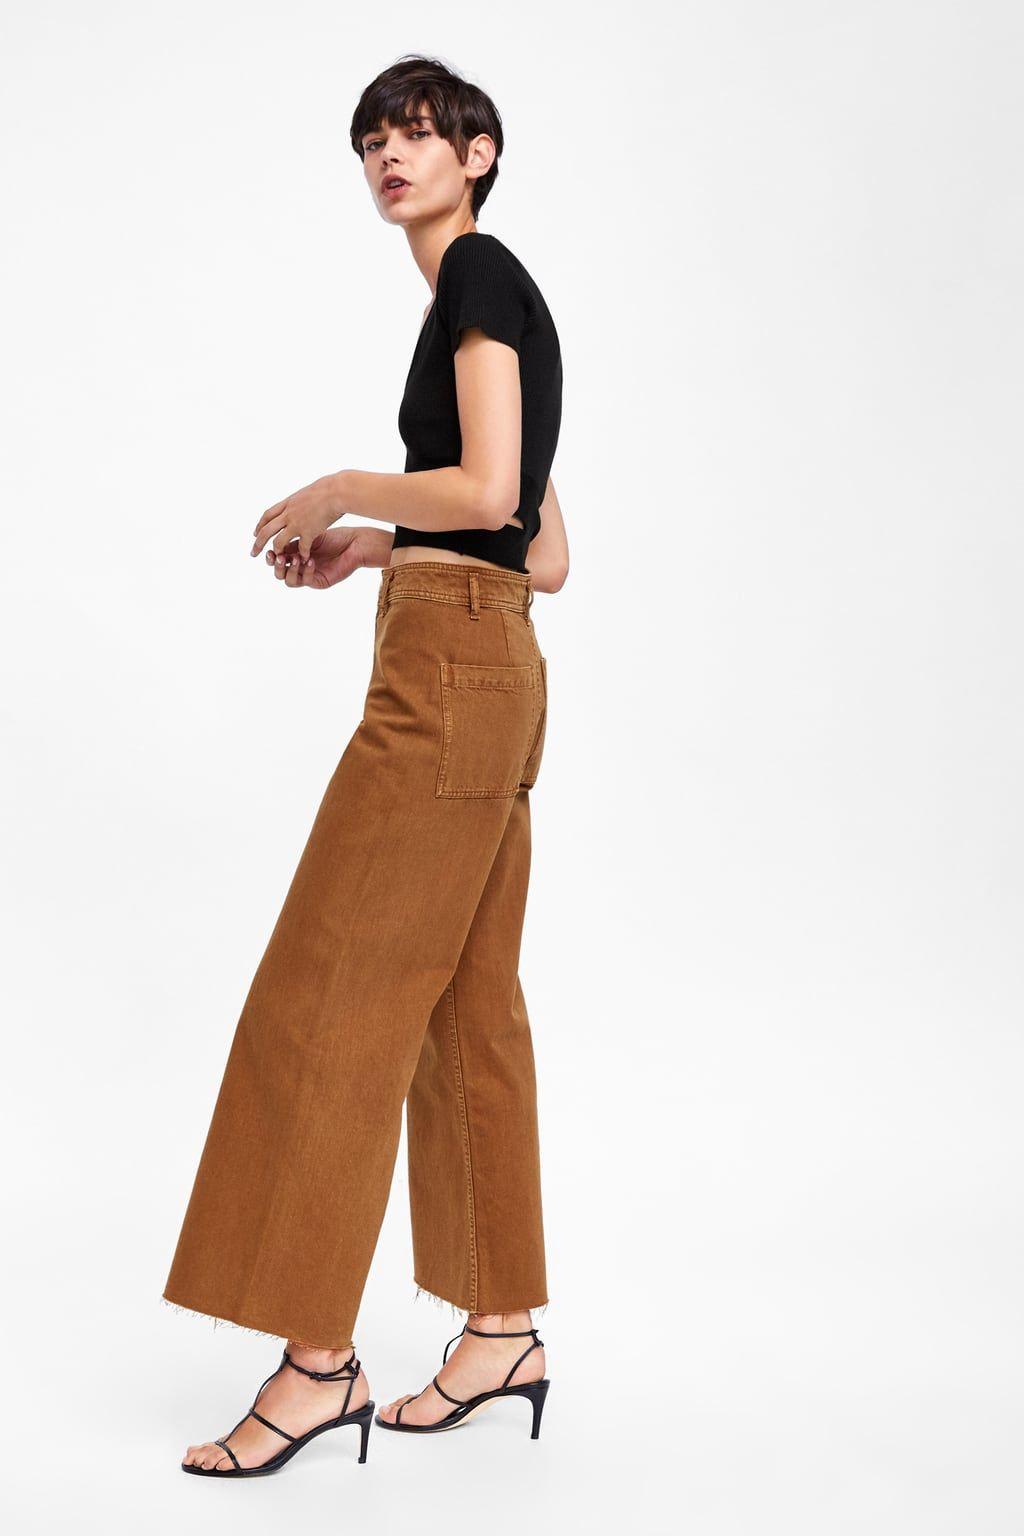 Afbeelding 6 Van Jeans Zw Premium Marine Straight Van Zara Jeans And Vans Straight Jeans Jeans